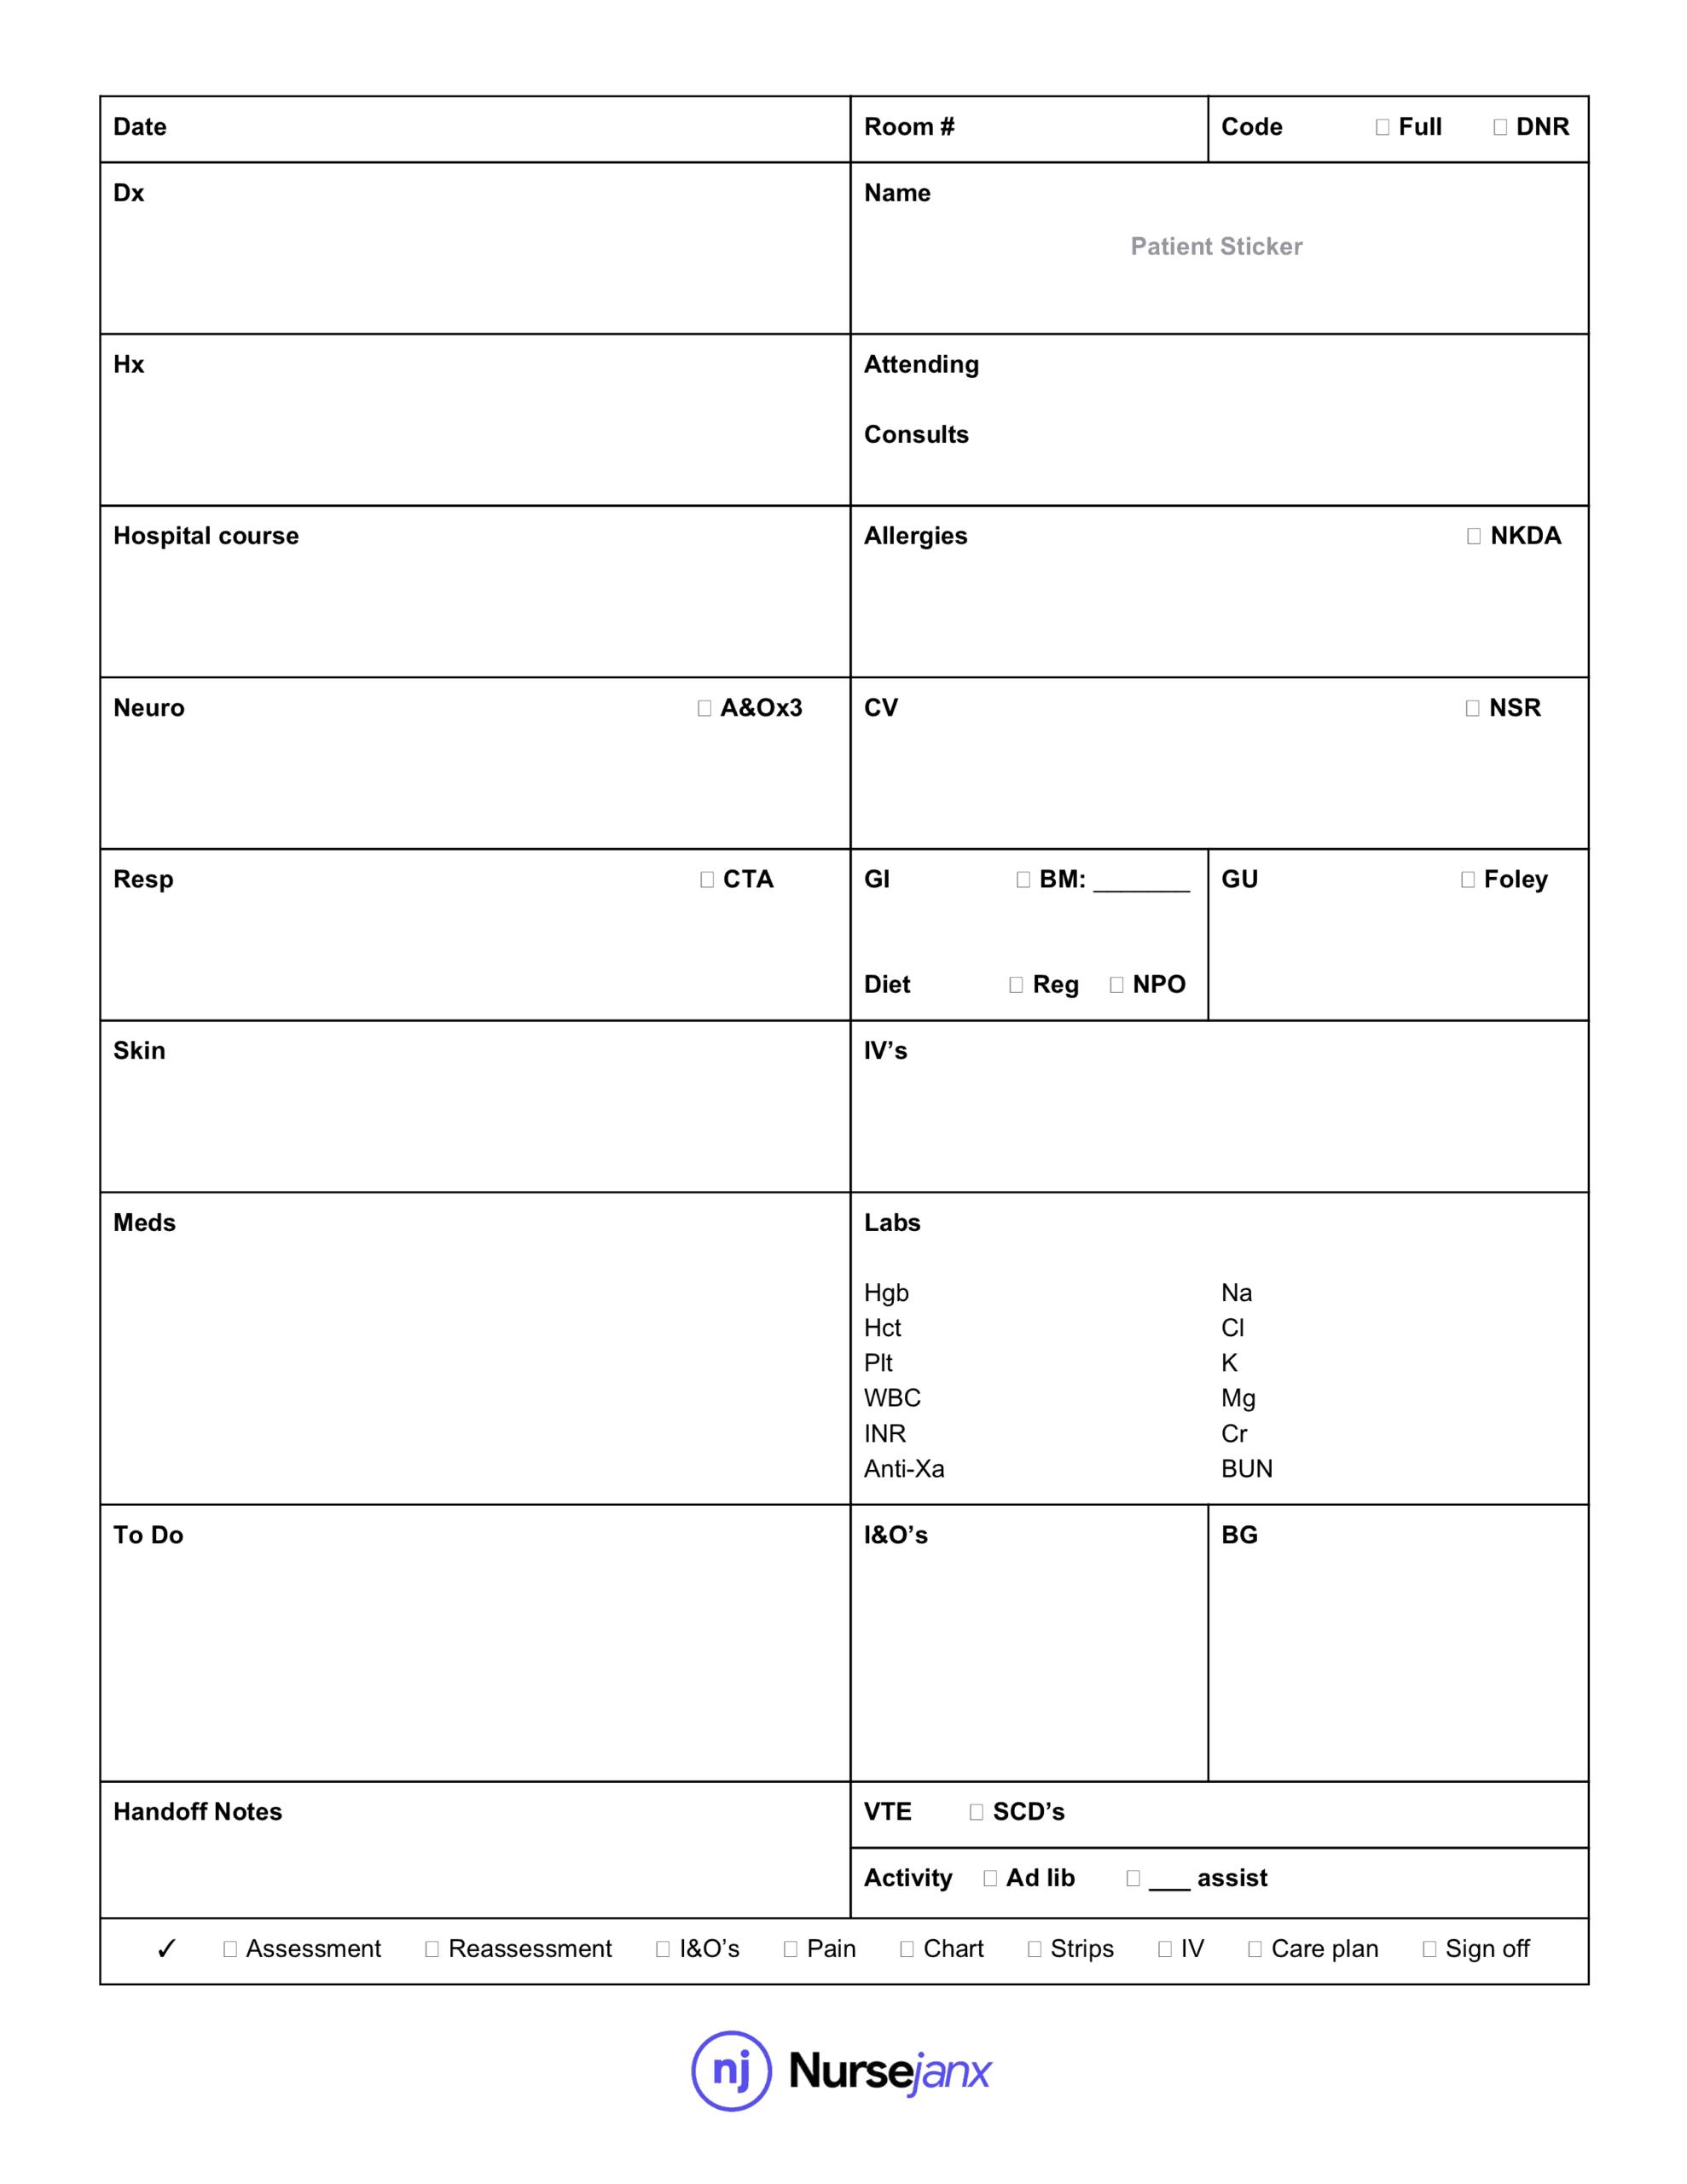 Nursing Report Sheet Template - Nursejanx For Nursing Report Sheet Template